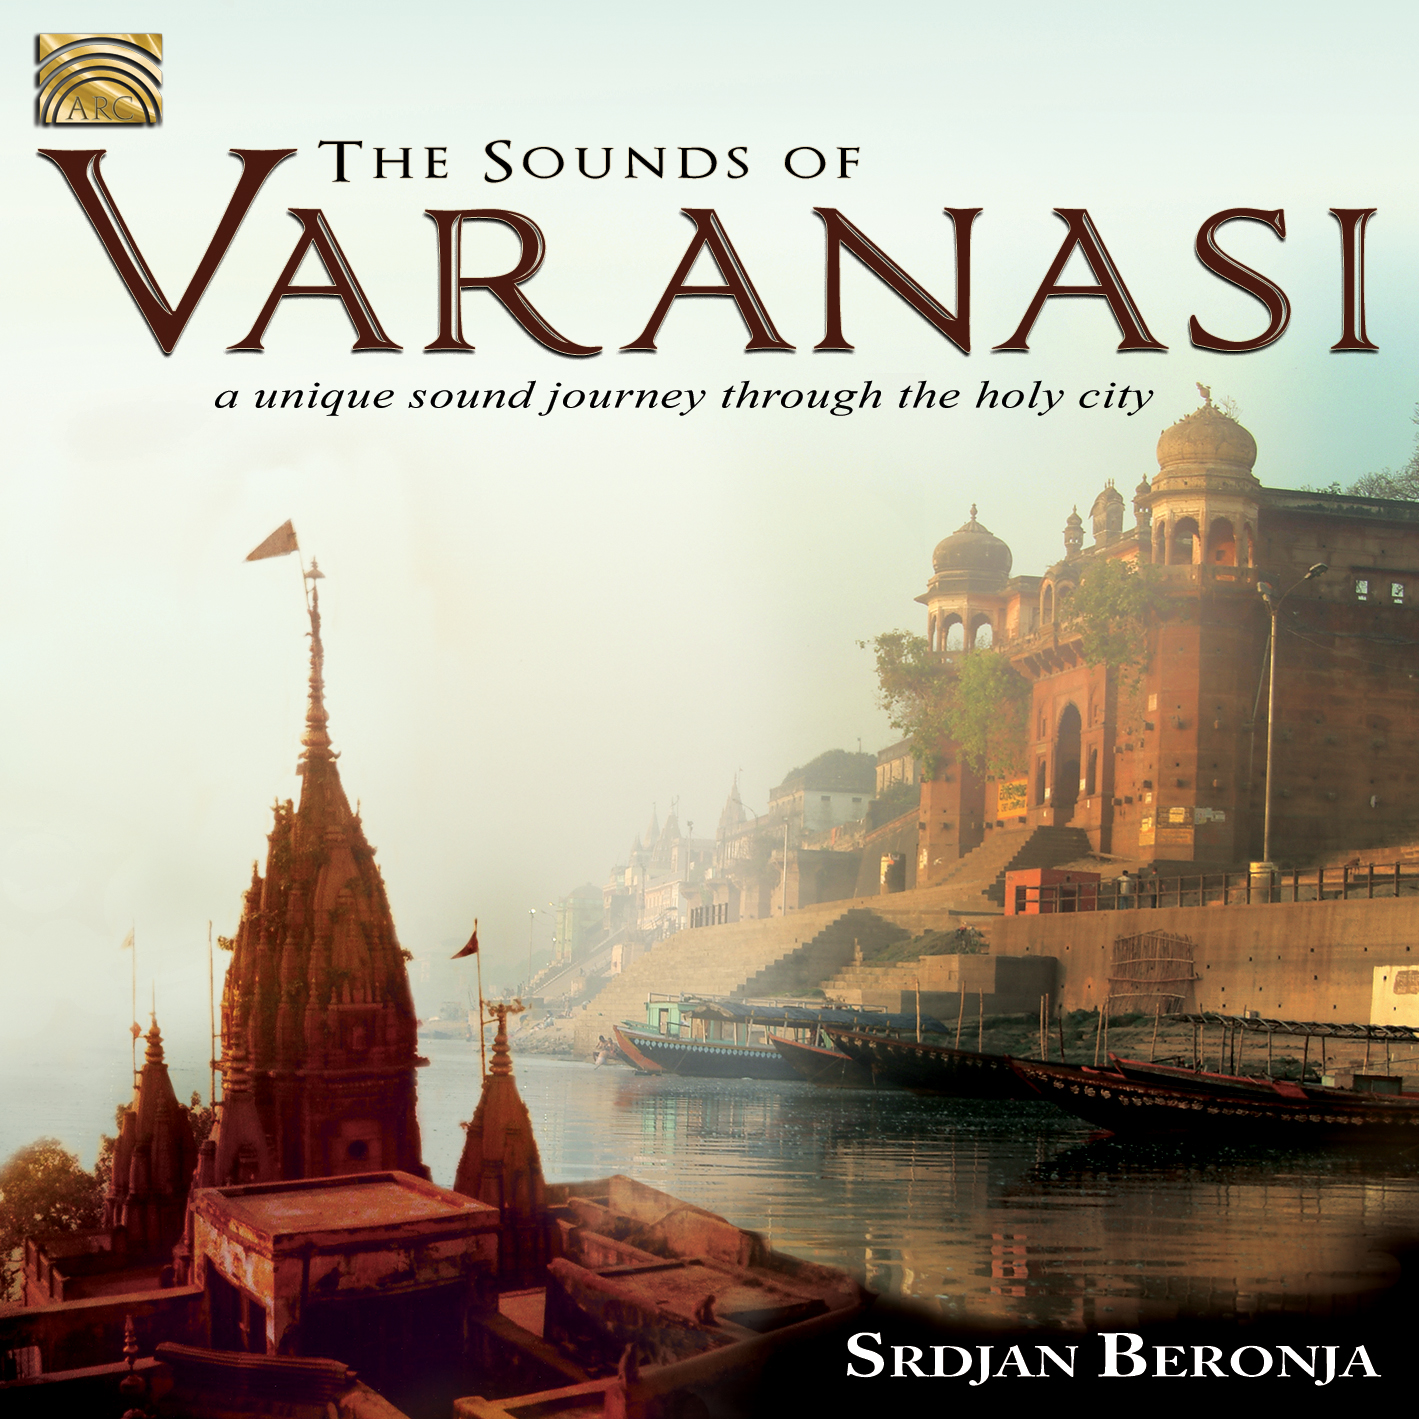 The Sounds of Varanasi